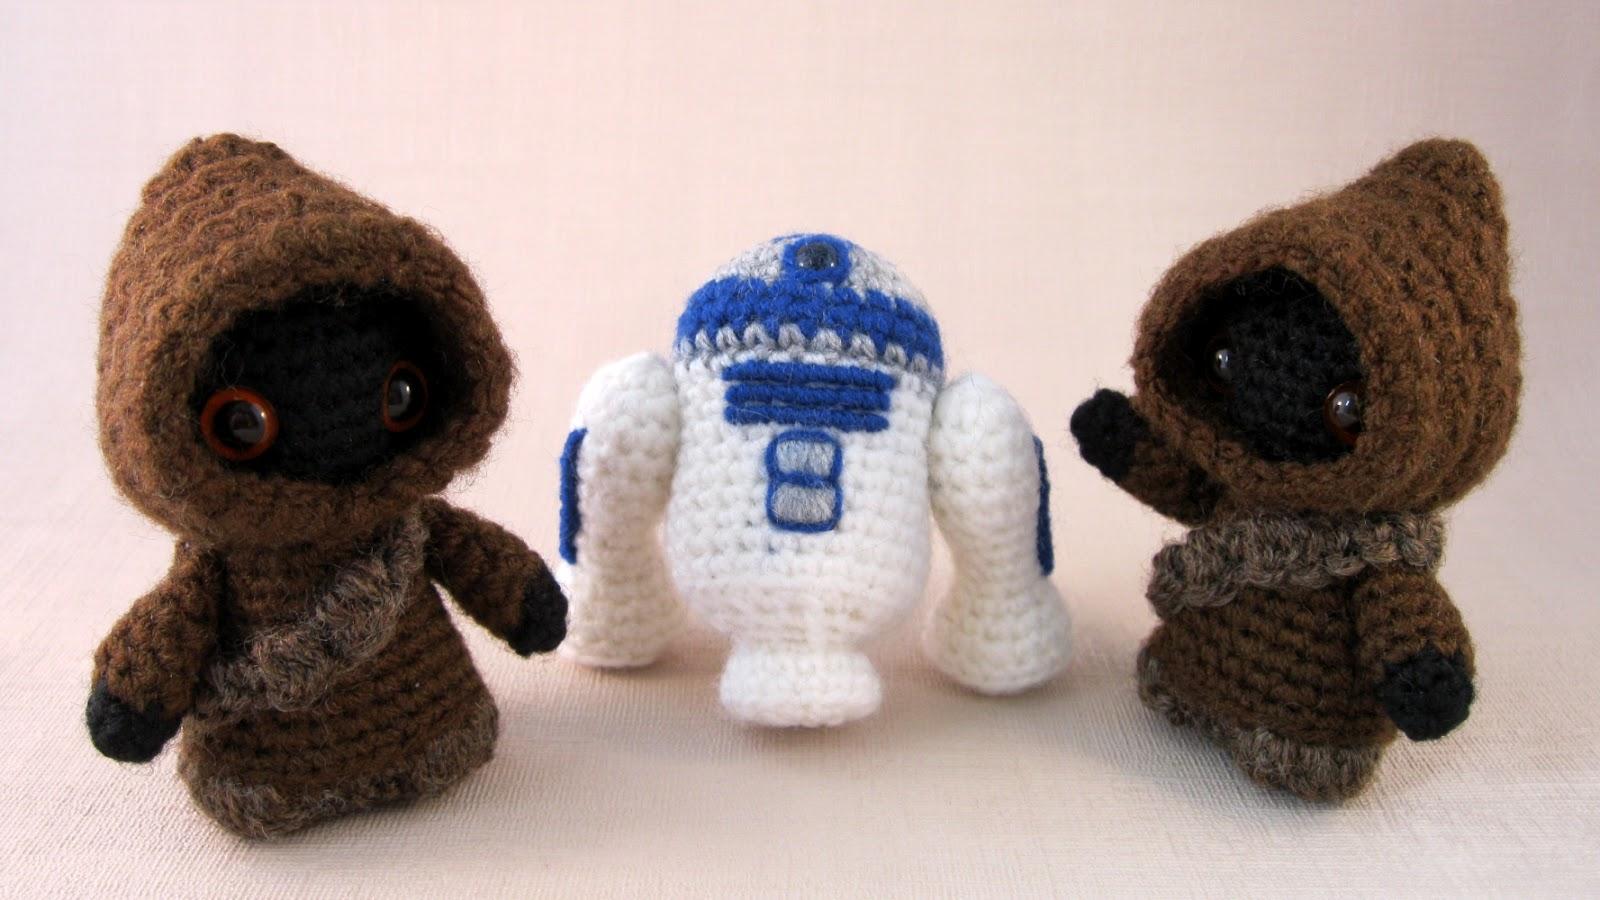 Geek Amigurumi Pattern : Lucyravenscar crochet creatures utini it s a new jawa pattern